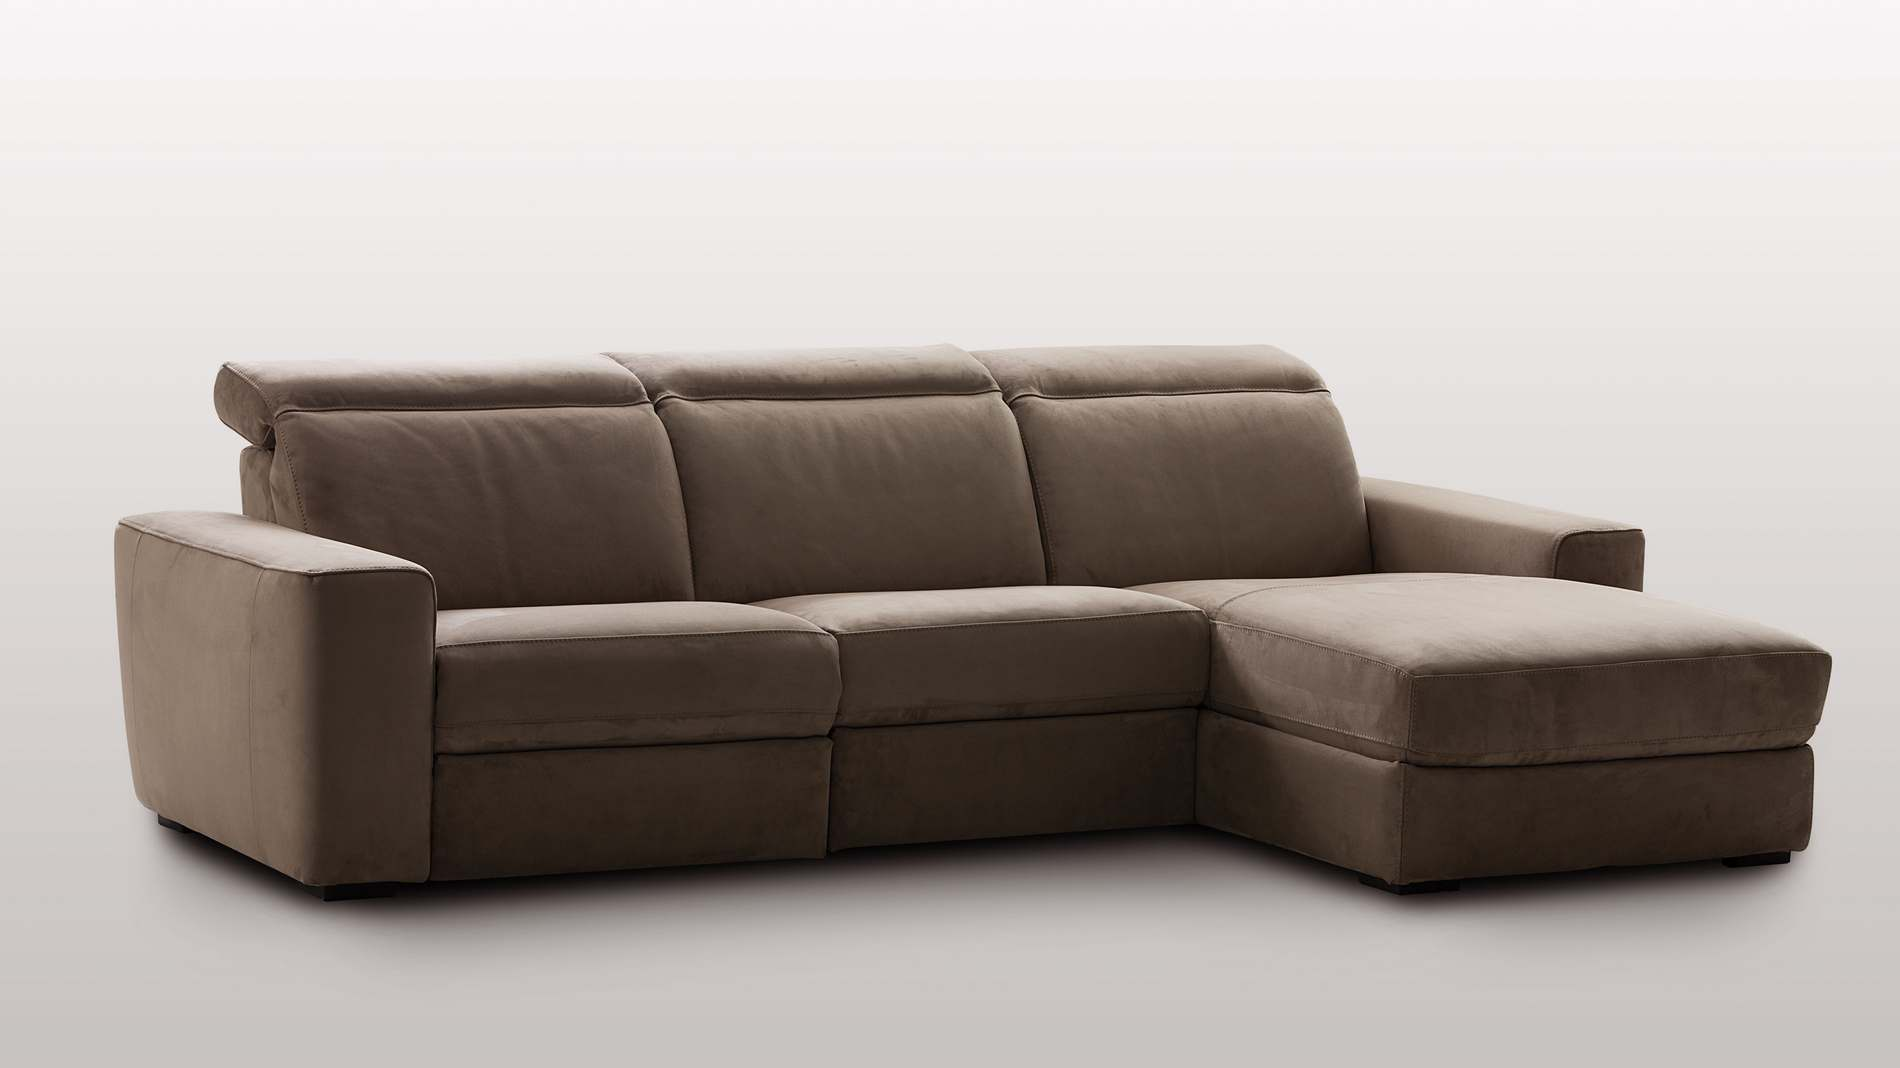 Natale arosio divani letti poltroncine e trasformabili - Imbottitura divani poliuretano ...